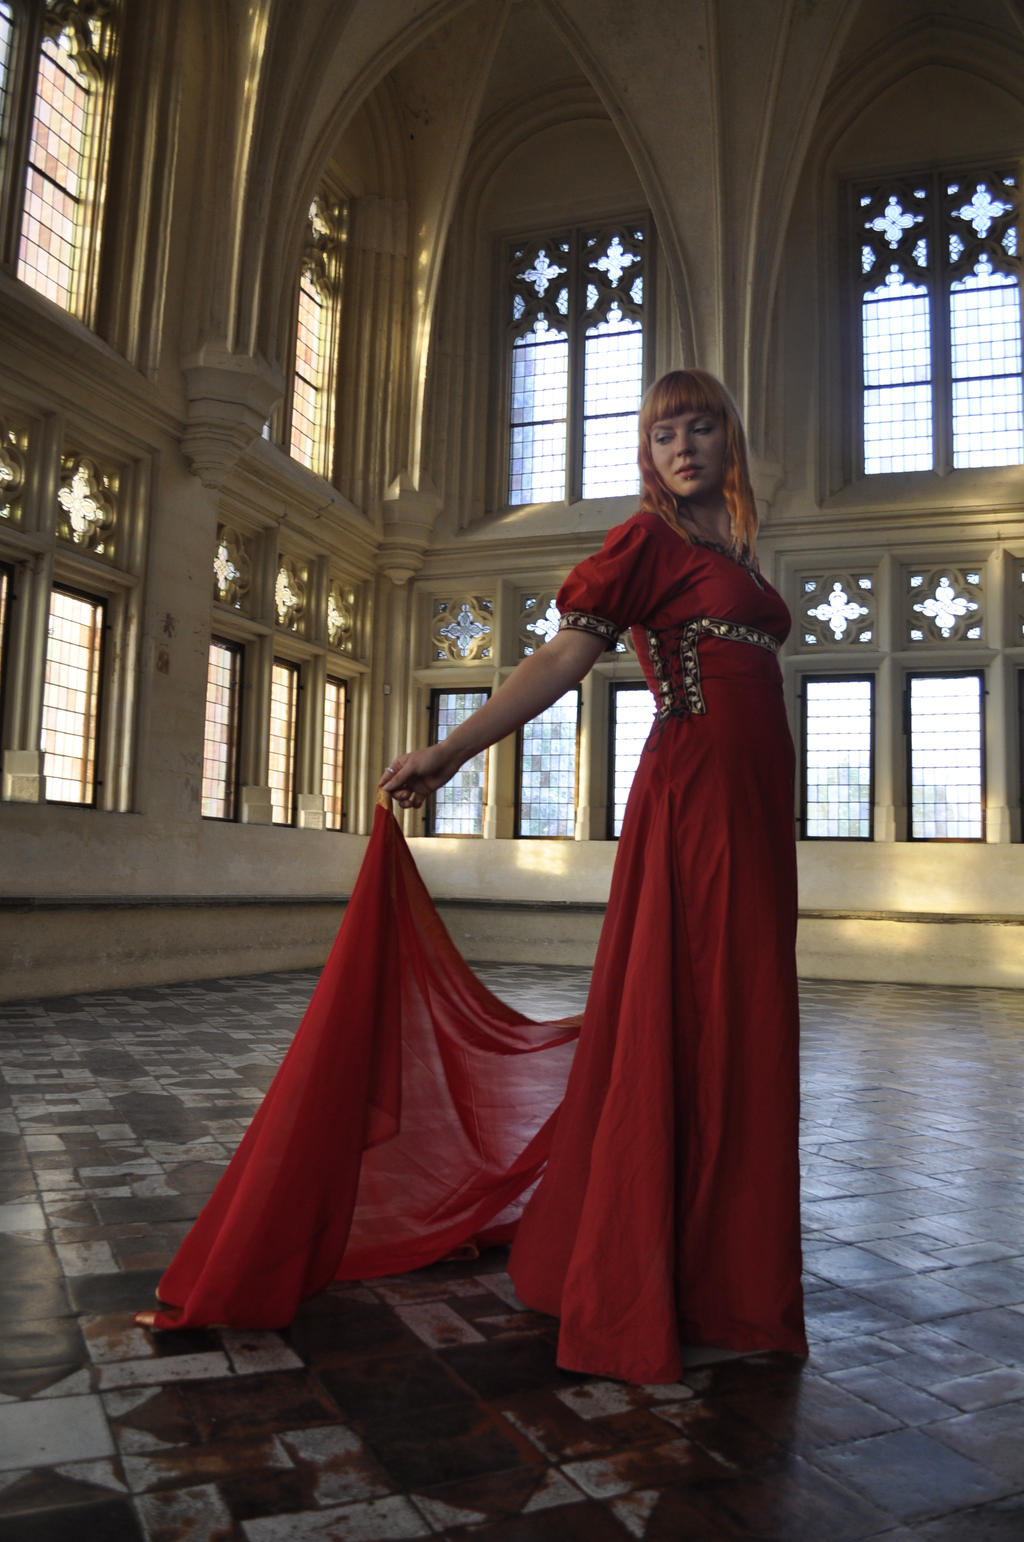 Red Priestess by HypnoticRose